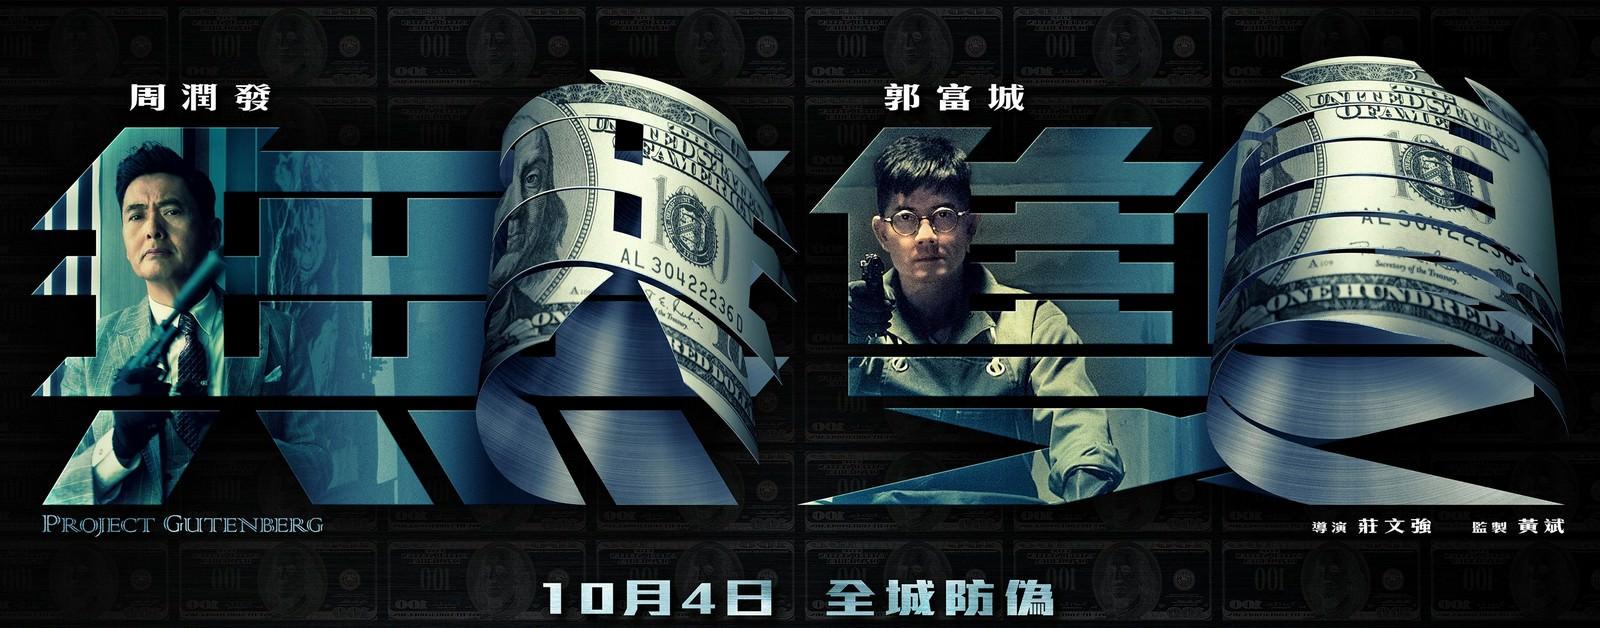 Movie, 無雙(中國.香港, 2018) / 無雙(台灣) / 无双(中國) / Project Gutenberg(英文), 電影海報, 香港, 橫版